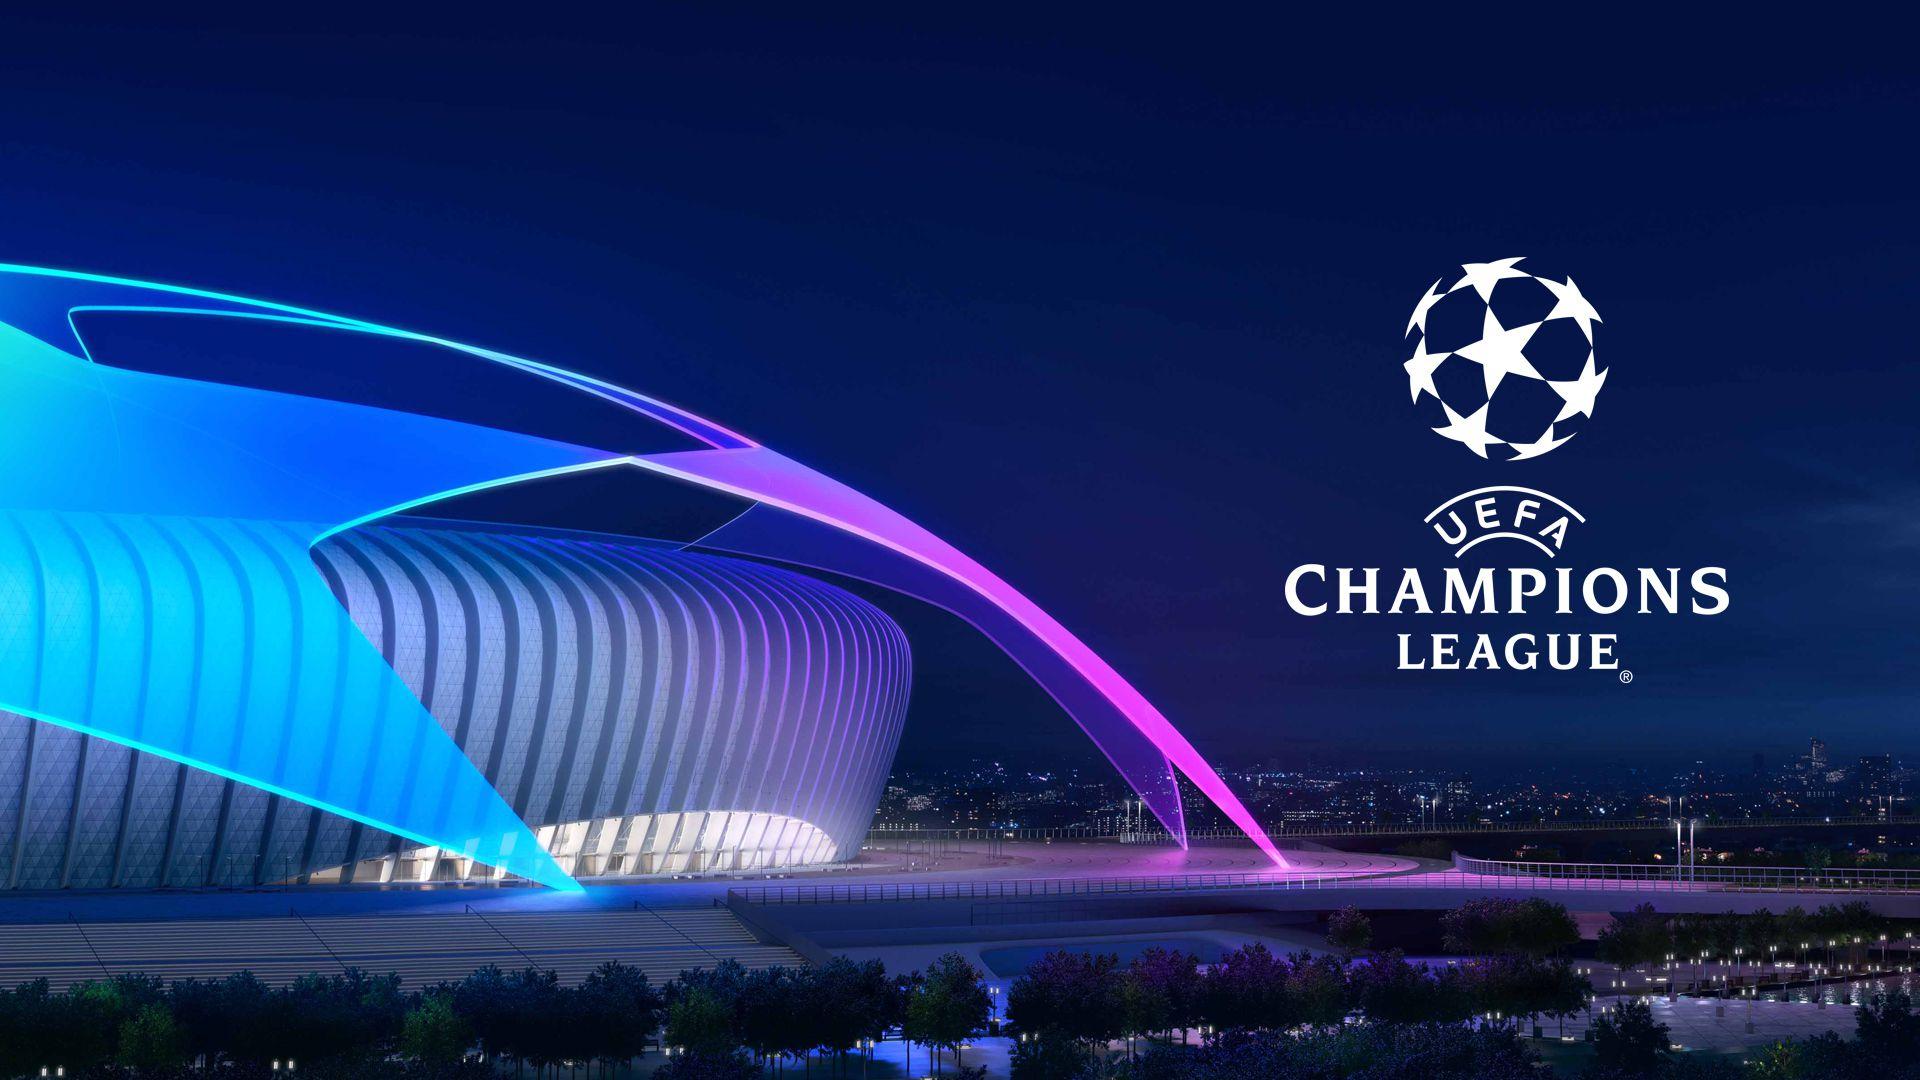 champions league 20 21 dates sevilla fc champions league 20 21 dates sevilla fc